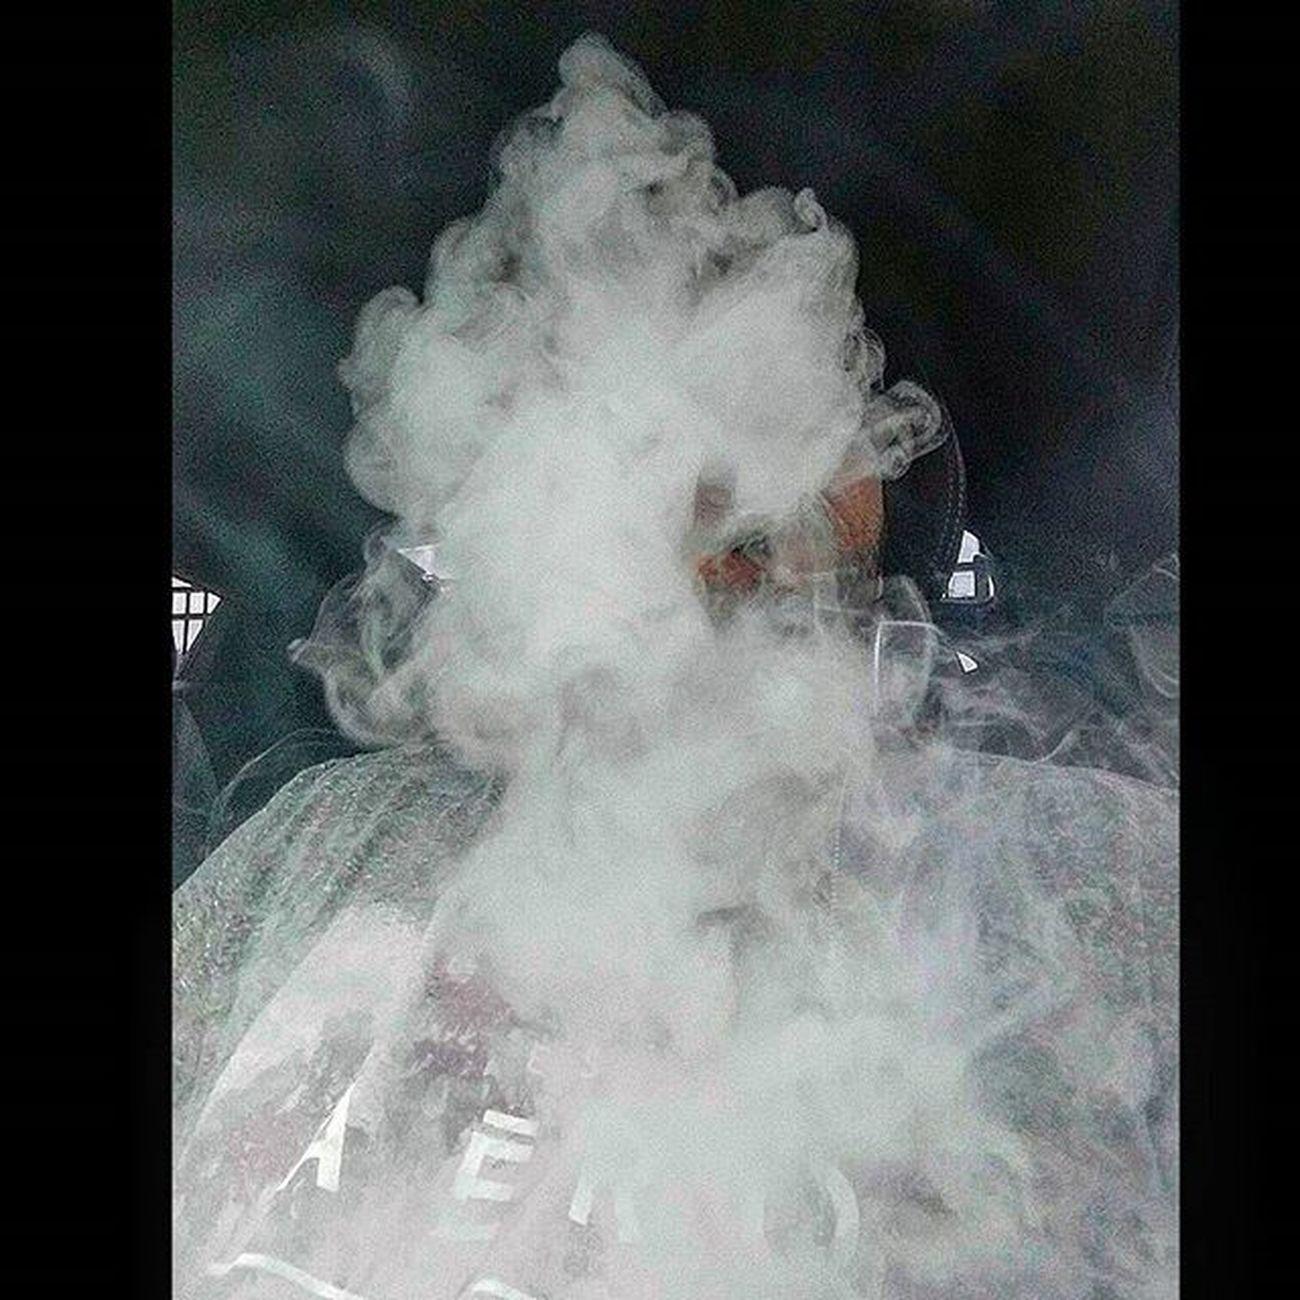 Please dont mind how I pursue. ... Dont take it personal that's how I do.... Vape Cloudchaser Vapesociety Vaper Vapeporn VapeLife Vapelyfe Vaporfanatics Ipv4 Black Herkules  Variablevoltage Variablewattage Temperaturecontrol 120W AllBlackEverything Cloudchasers Cloudporn Vape4life Vapeclouds